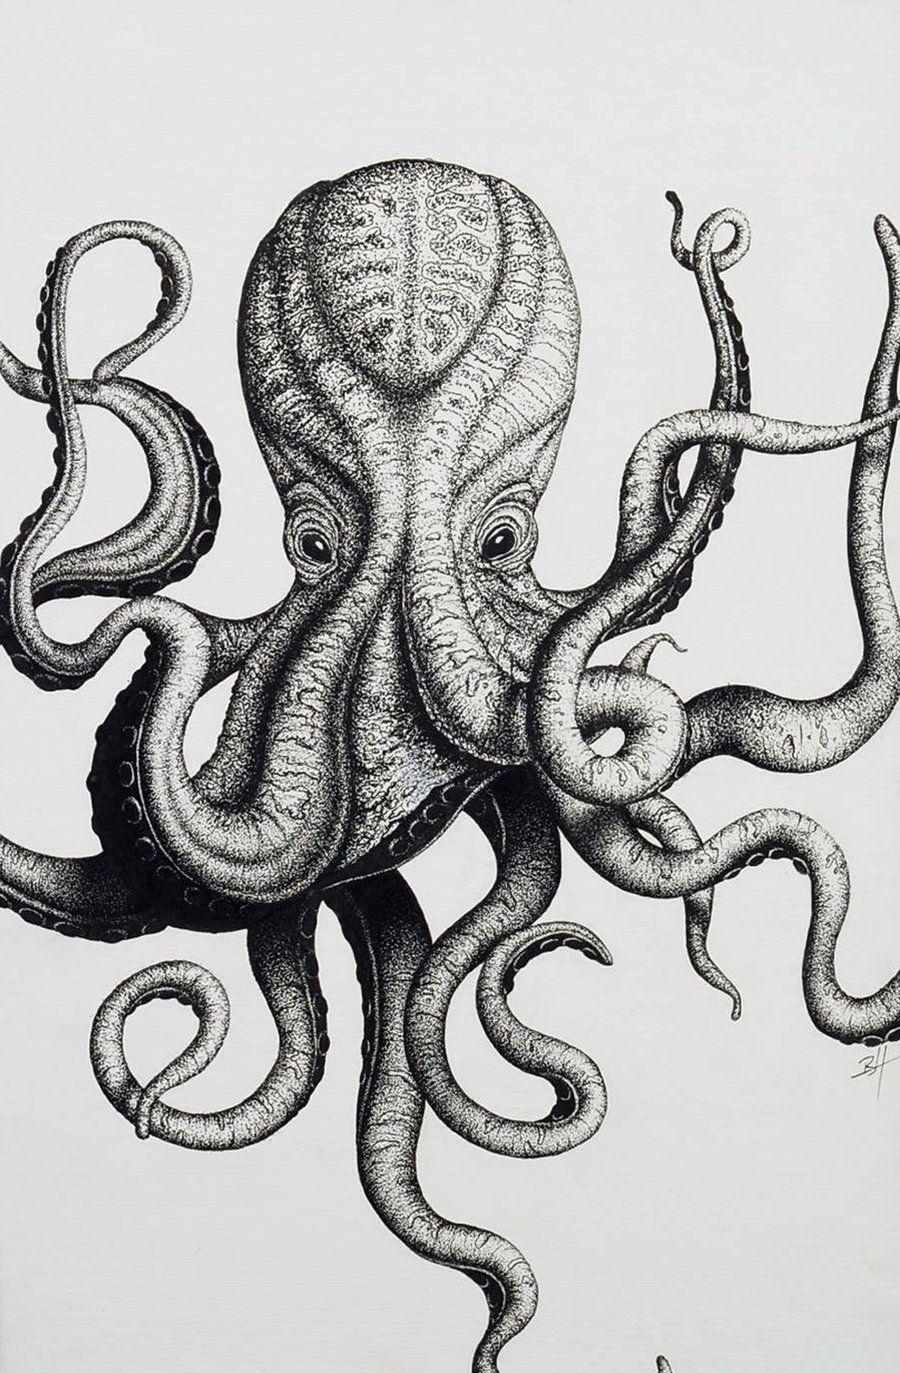 Octopus sketch style buscar con google octopus pinterest